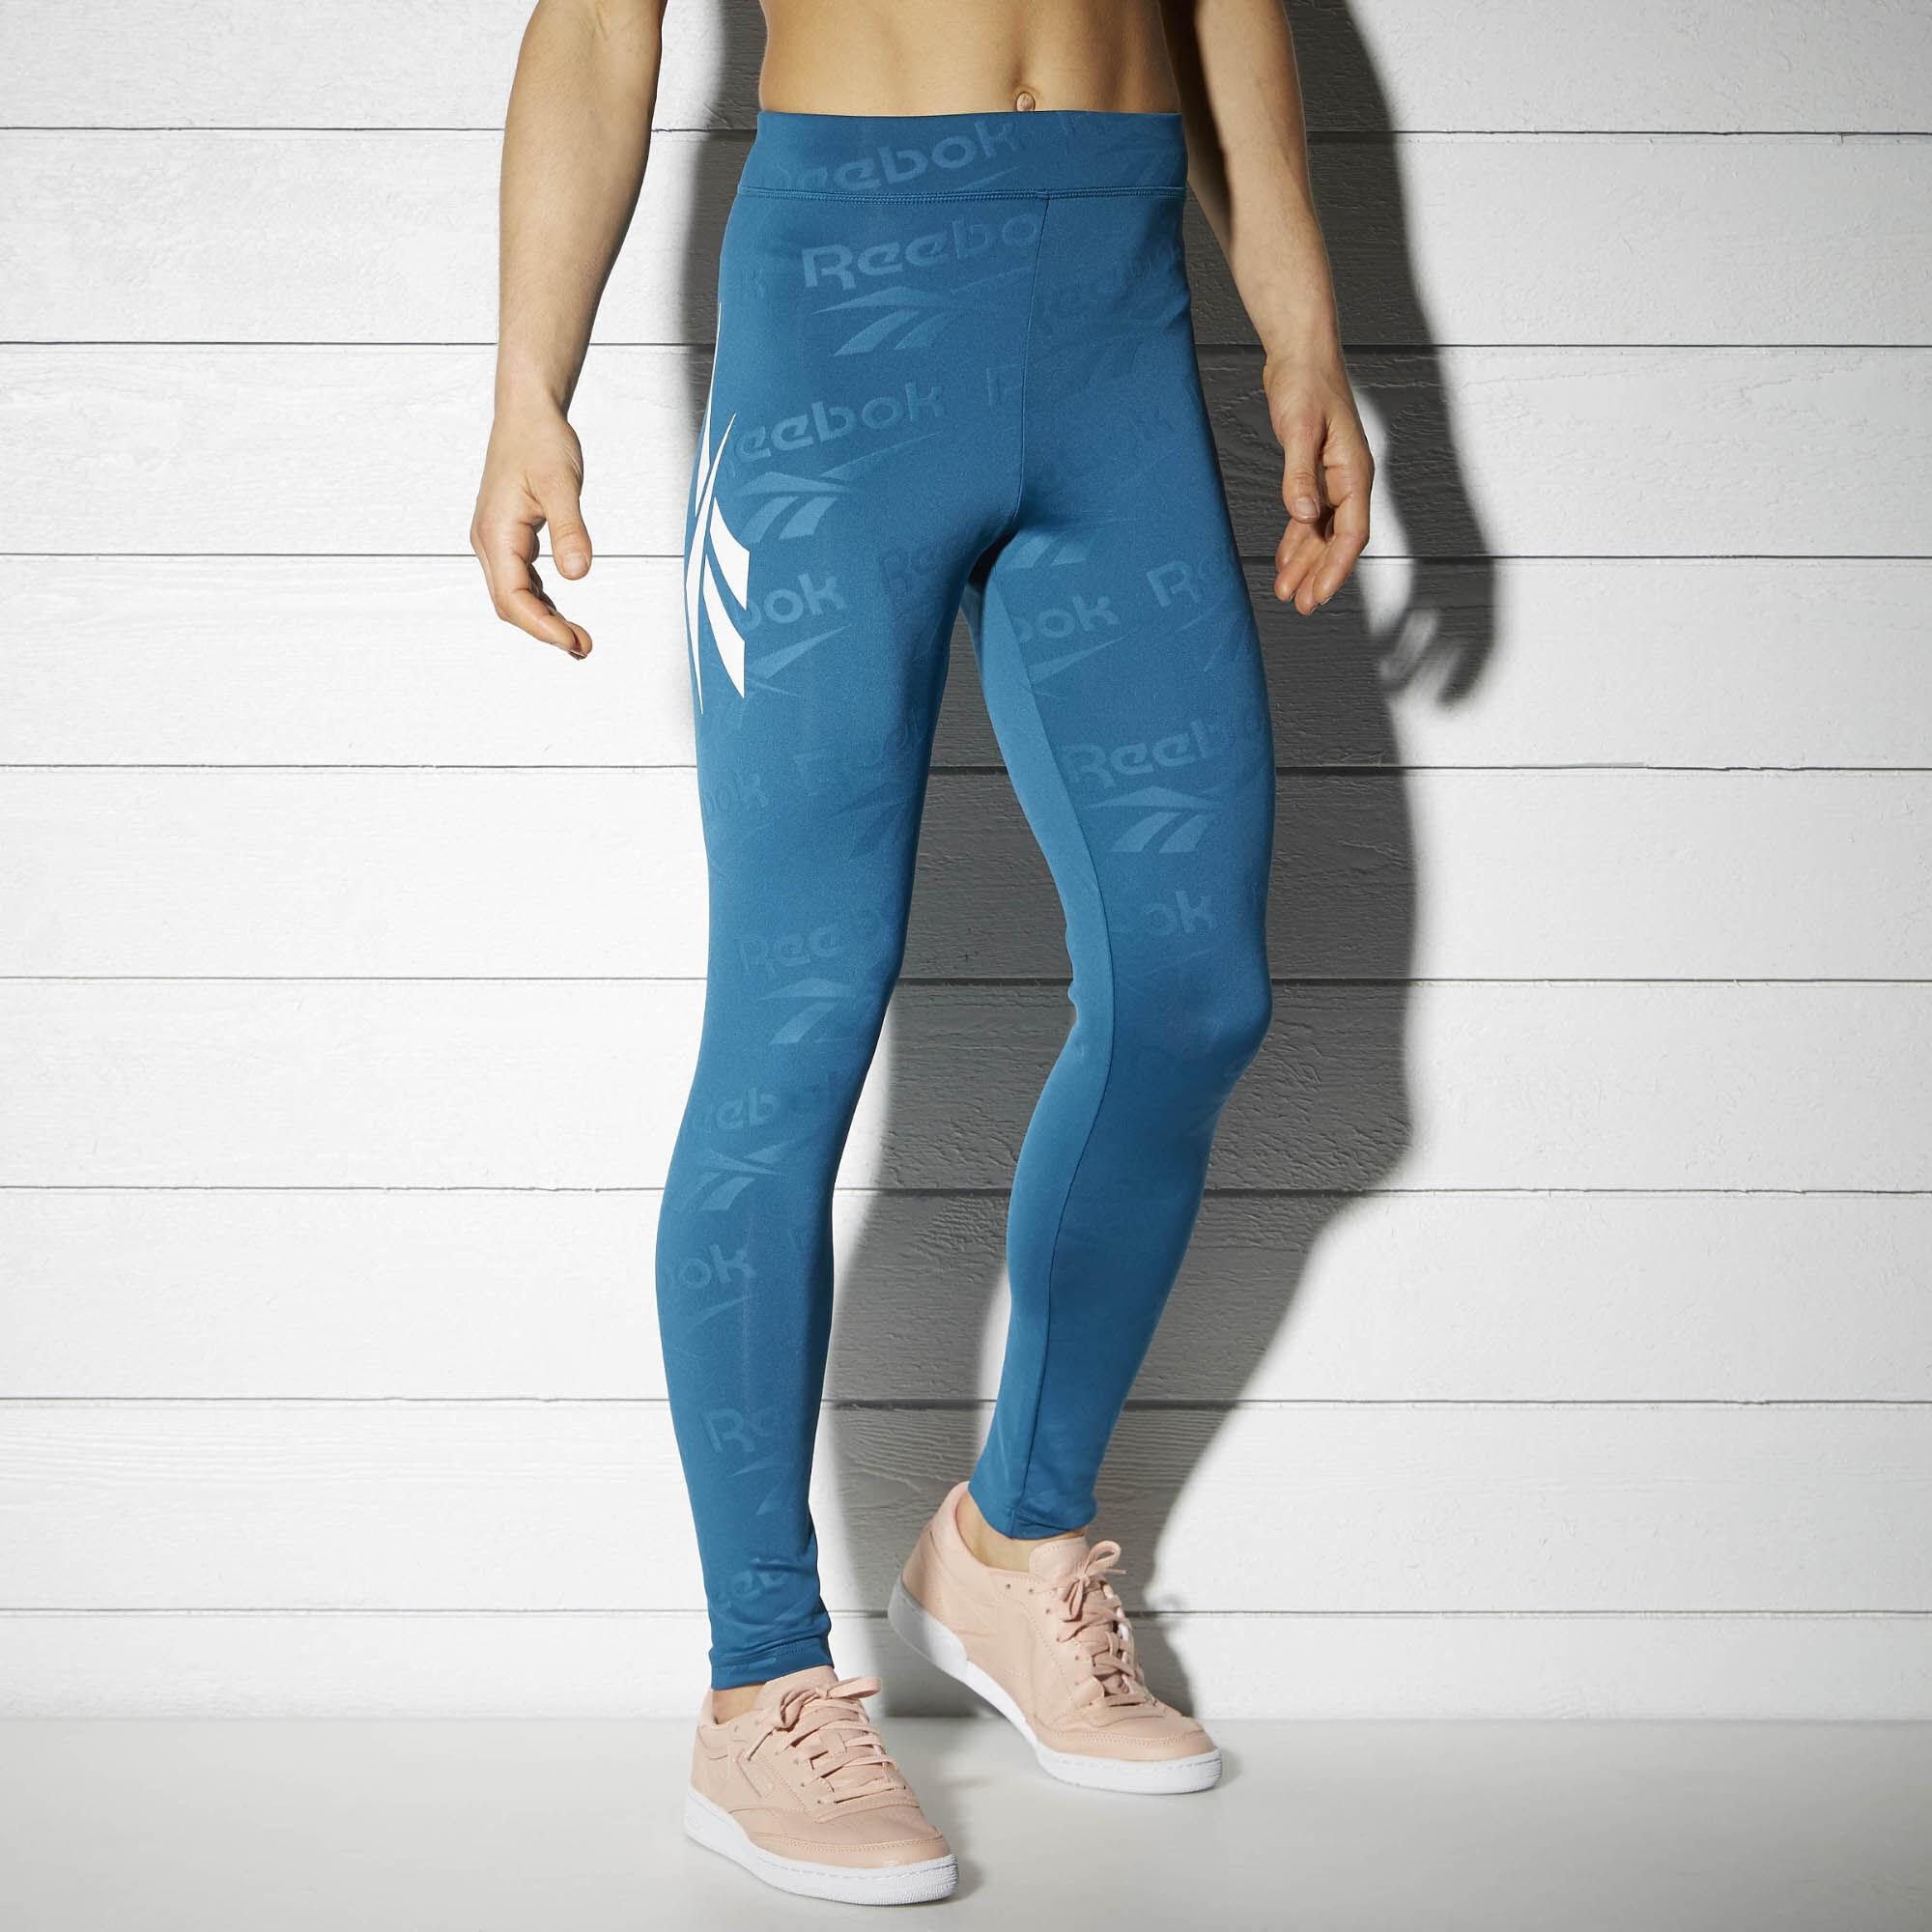 Buy reebok joggers 2016   OFF31% Discounted 40ec452797f7